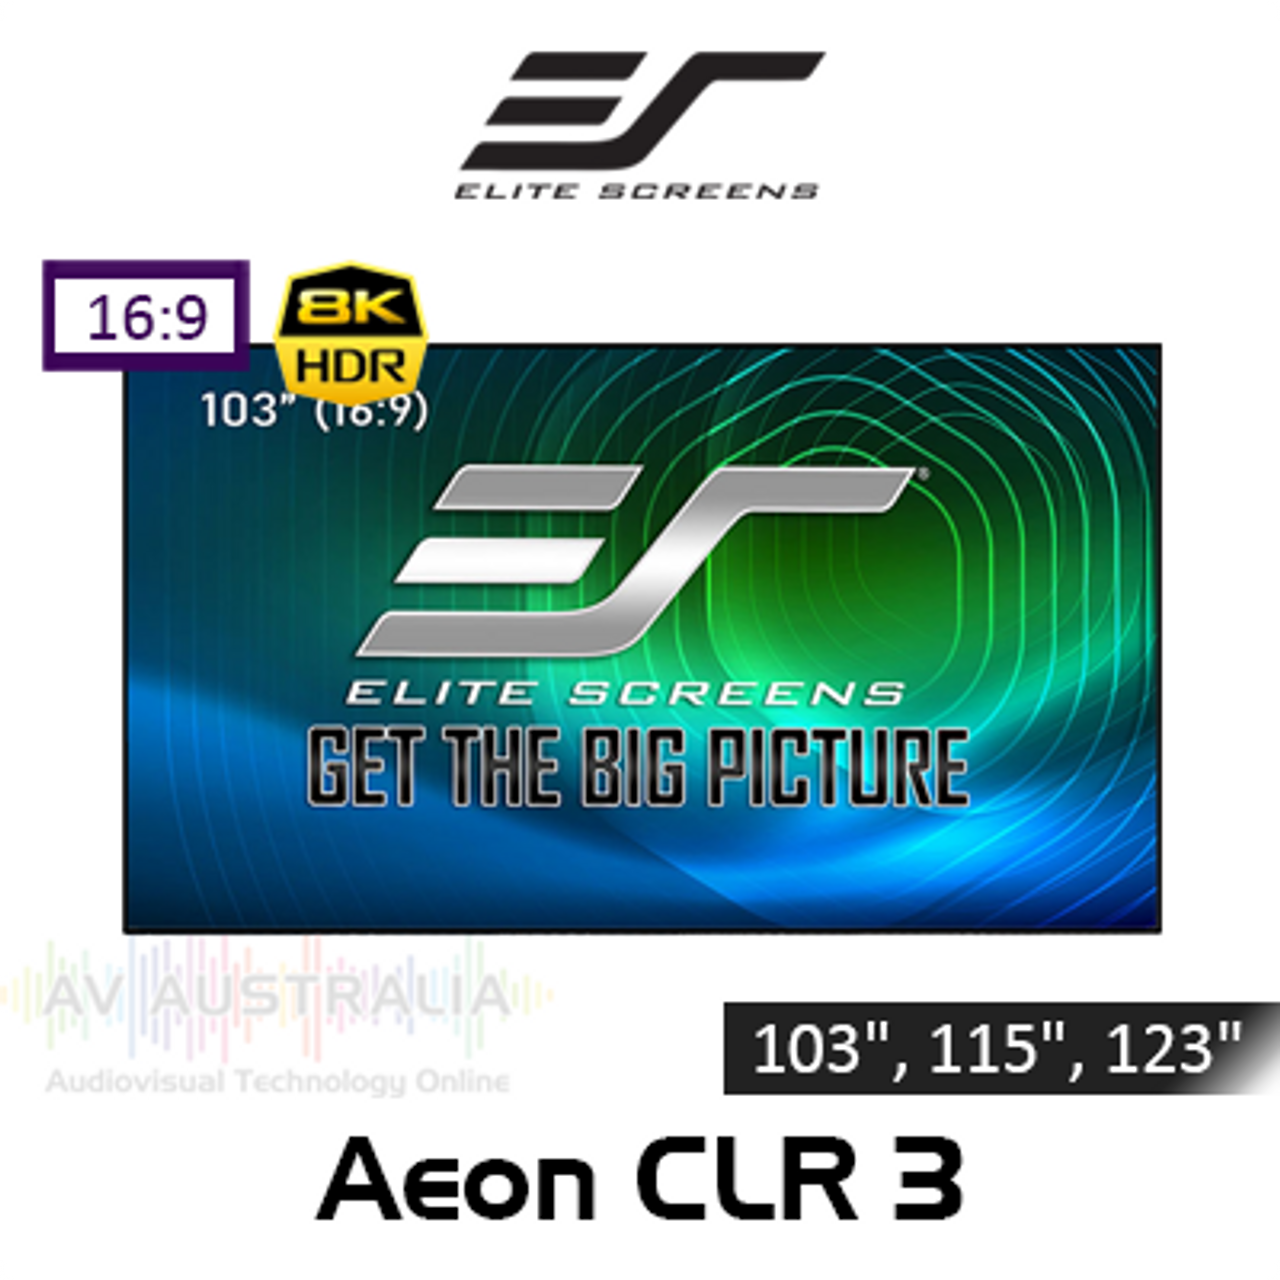 "Elite Screens Aeon CLR 3 Edge Free 8K/4K 16:9 Fixed Frame Projection Screens (103"", 115"", 123"")"